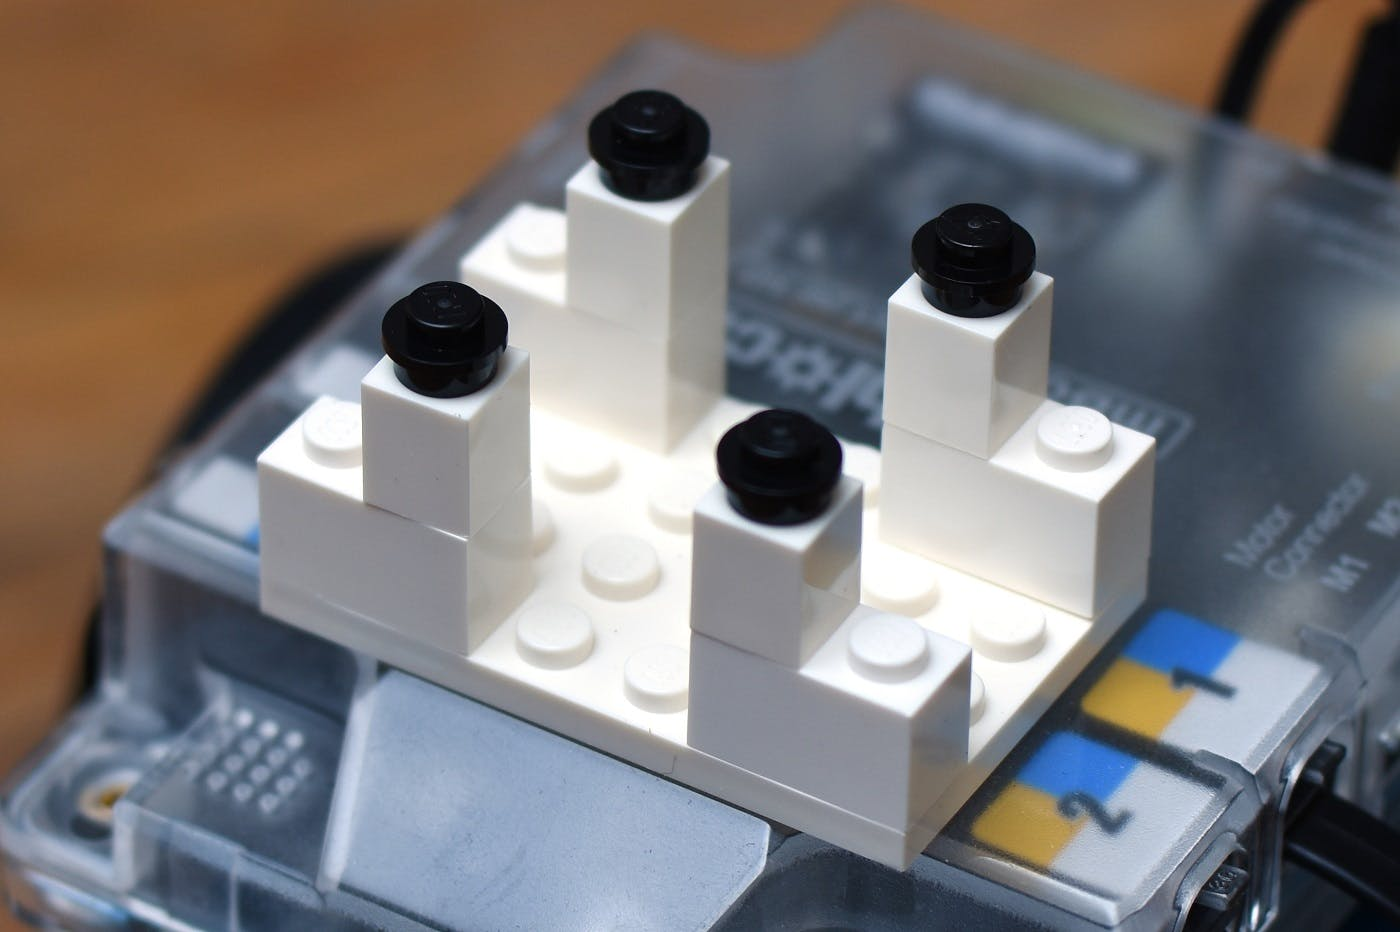 Simple Lego holder.